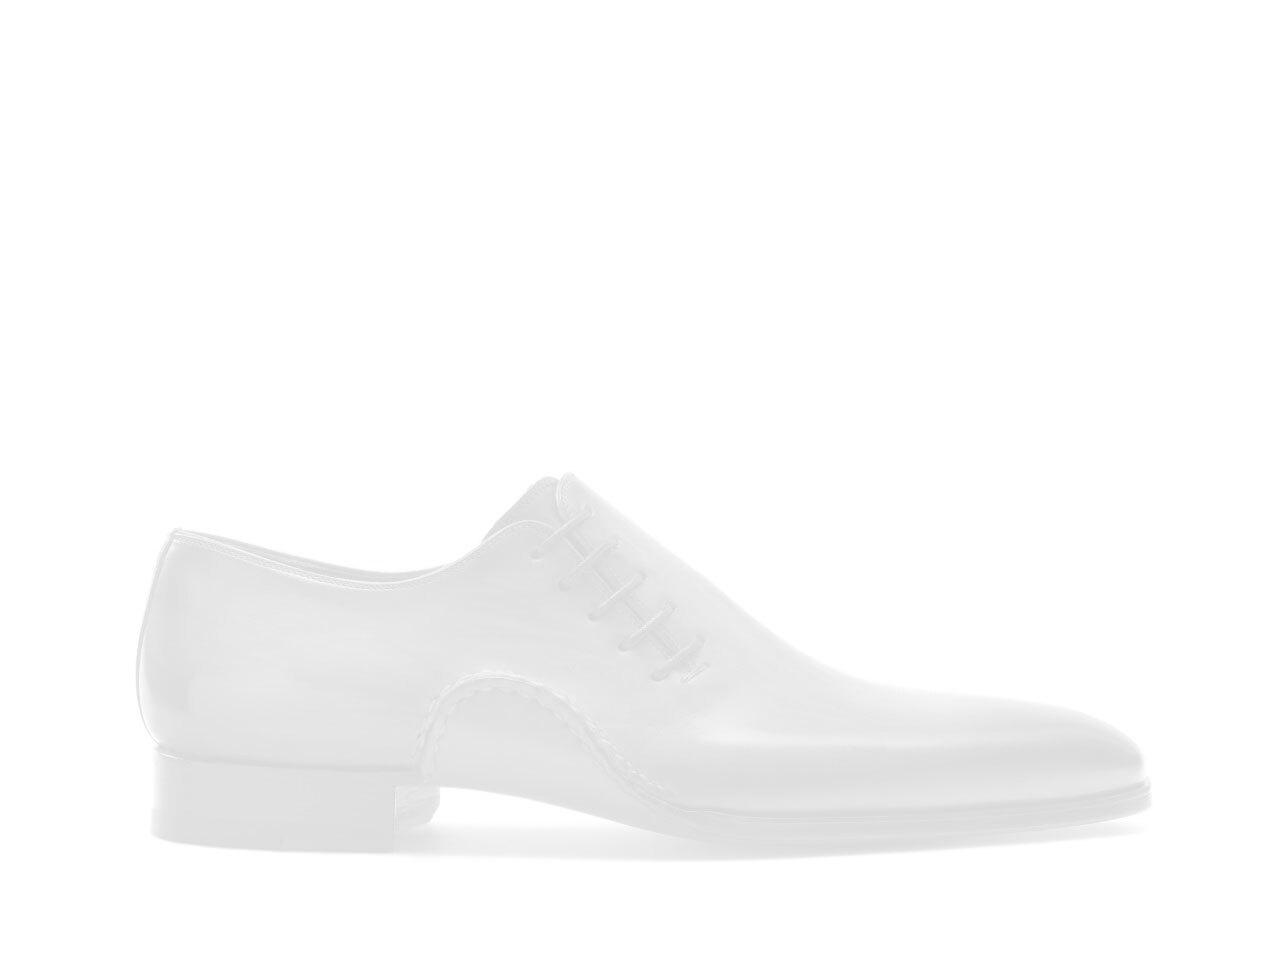 Side view of the Magnanni Dante Black Patent Men's Derby Shoes